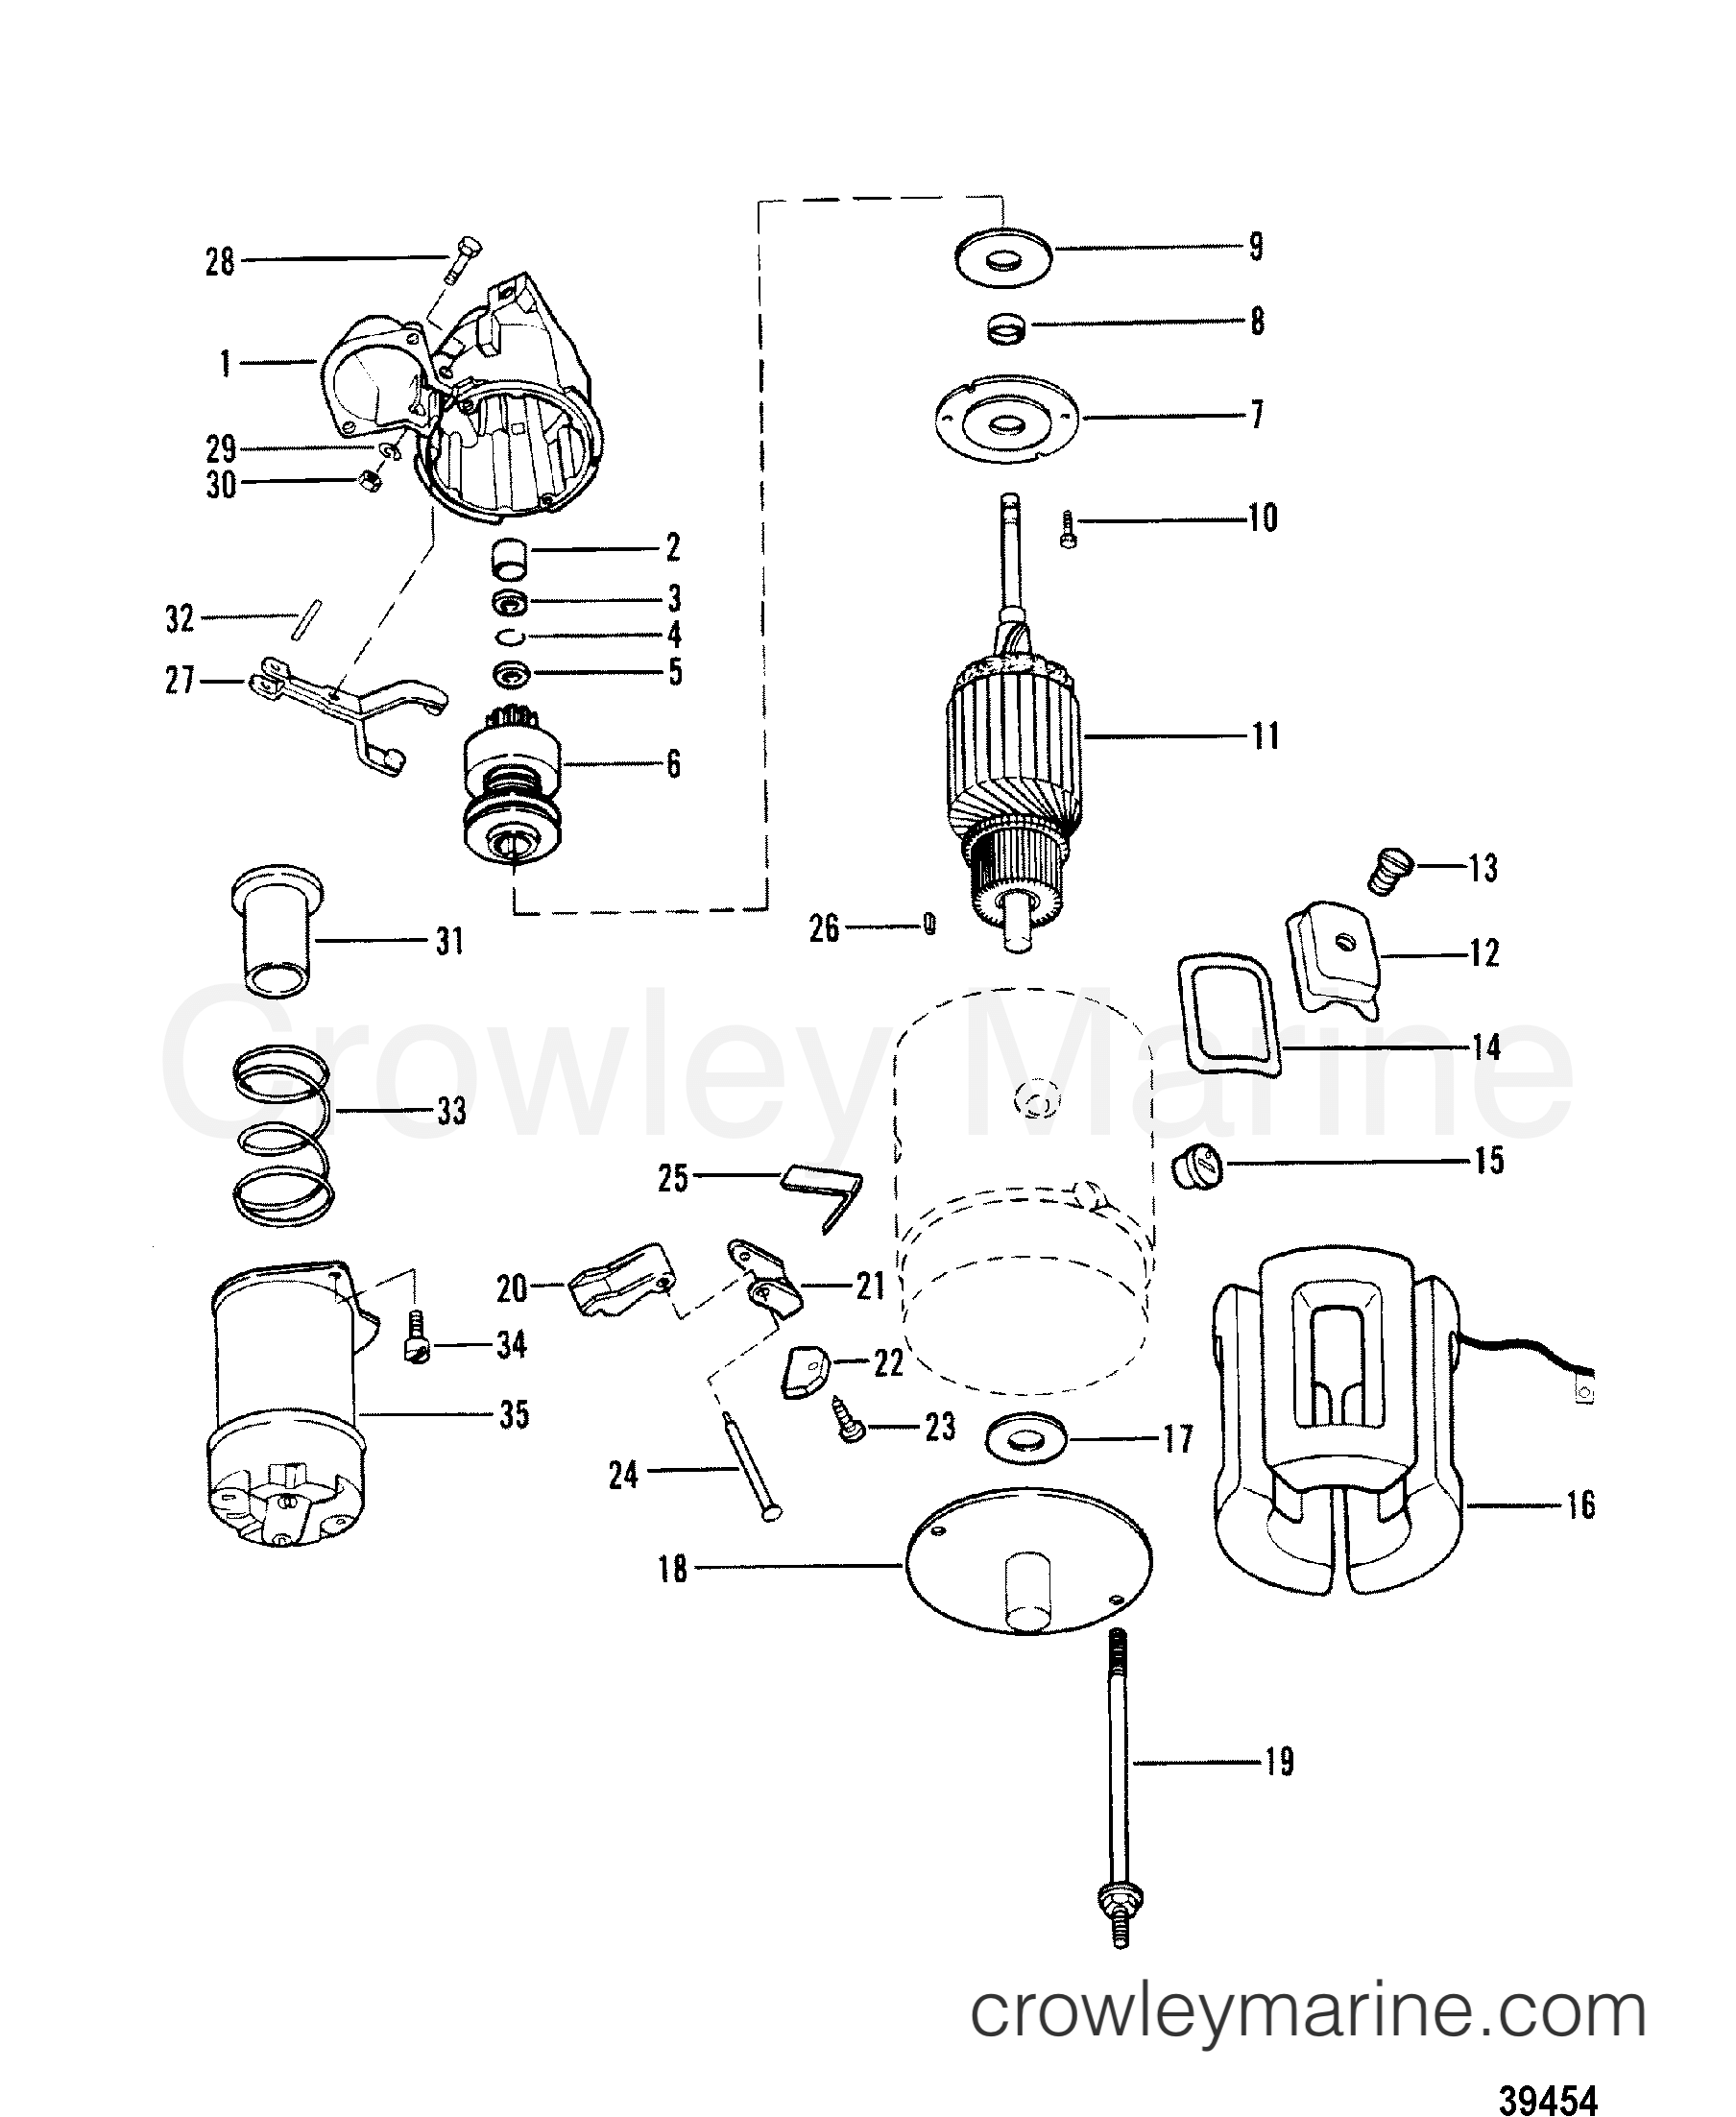 starter motor assembly 1985 mercruiser 170 01701335 crowley marine